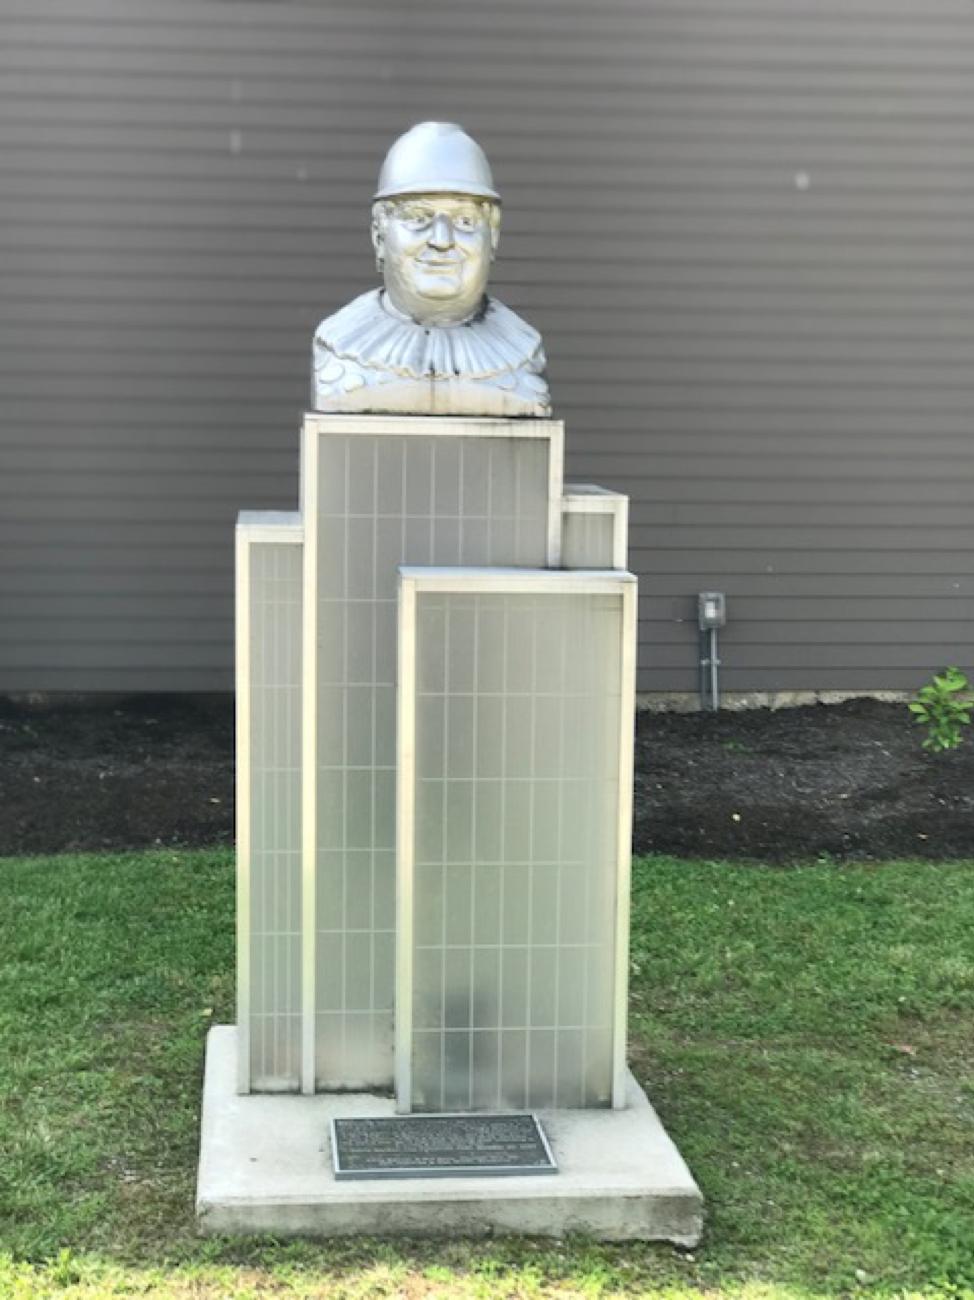 Raymond Thunder-Sky monument in front of the Hellmann Creative Center in Covington.